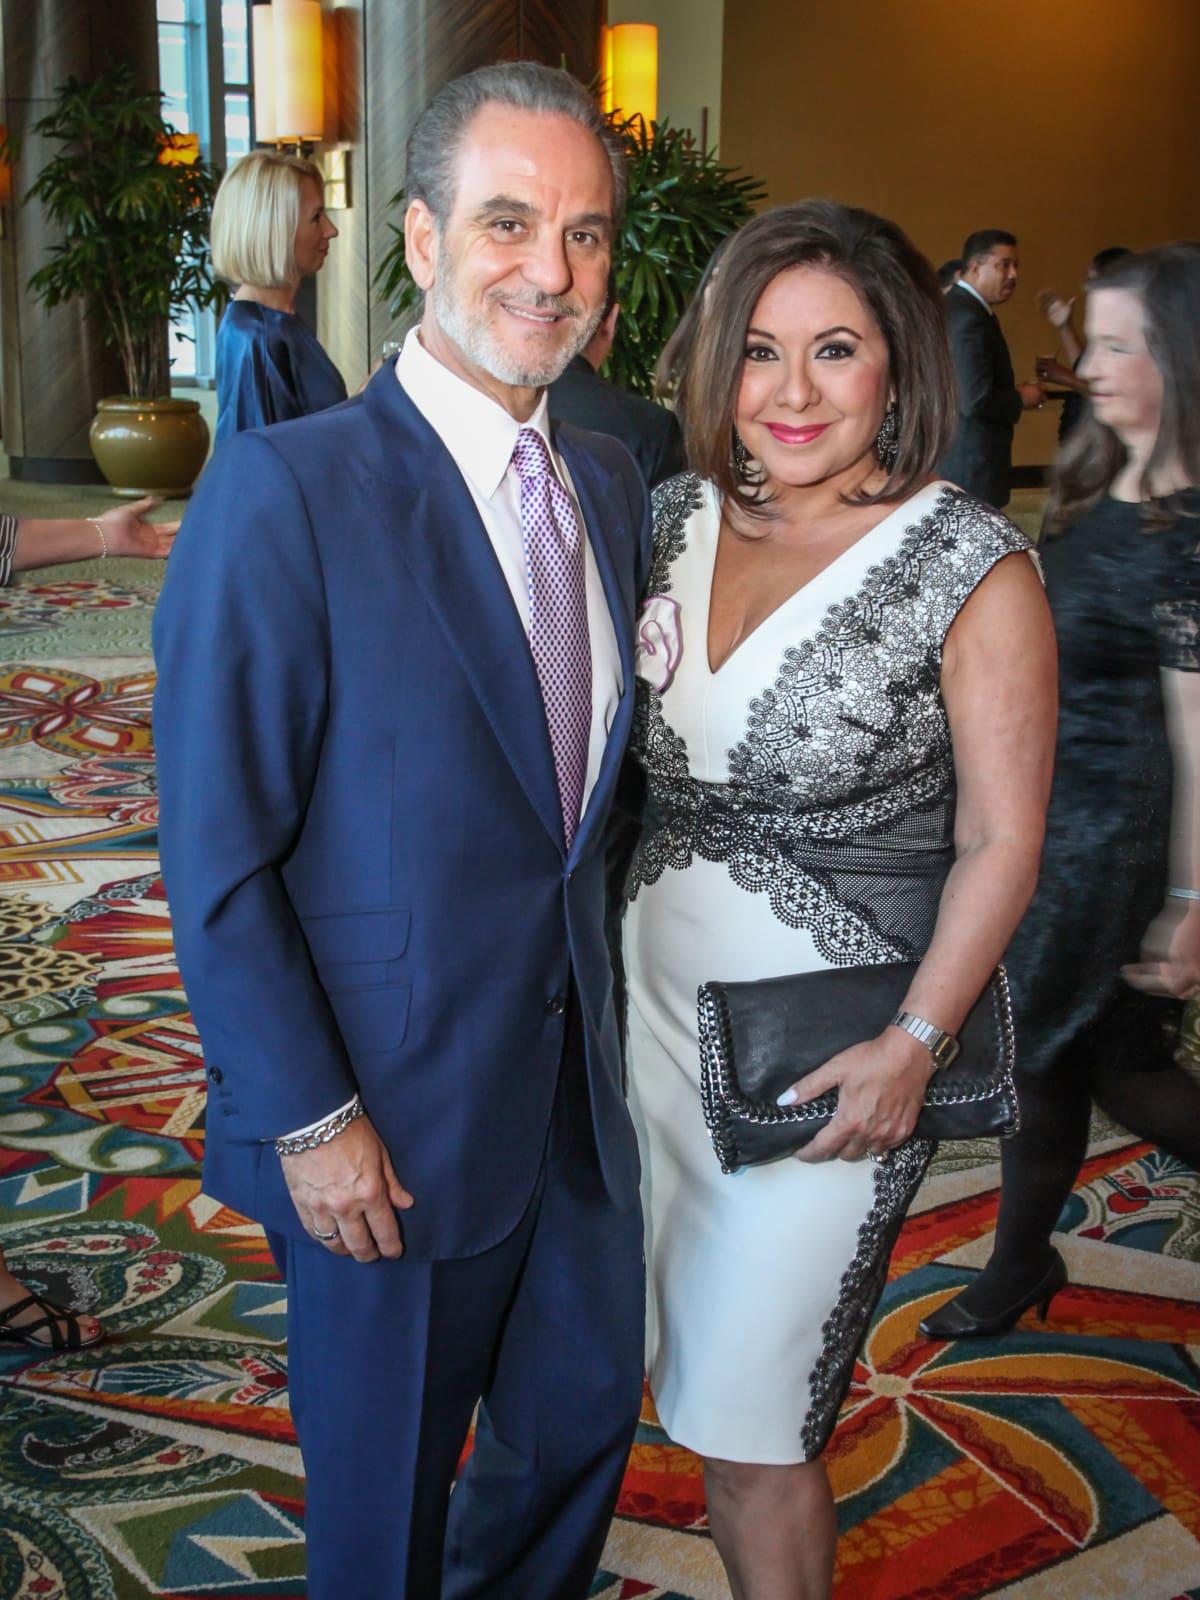 Rudy and Debbie Festari